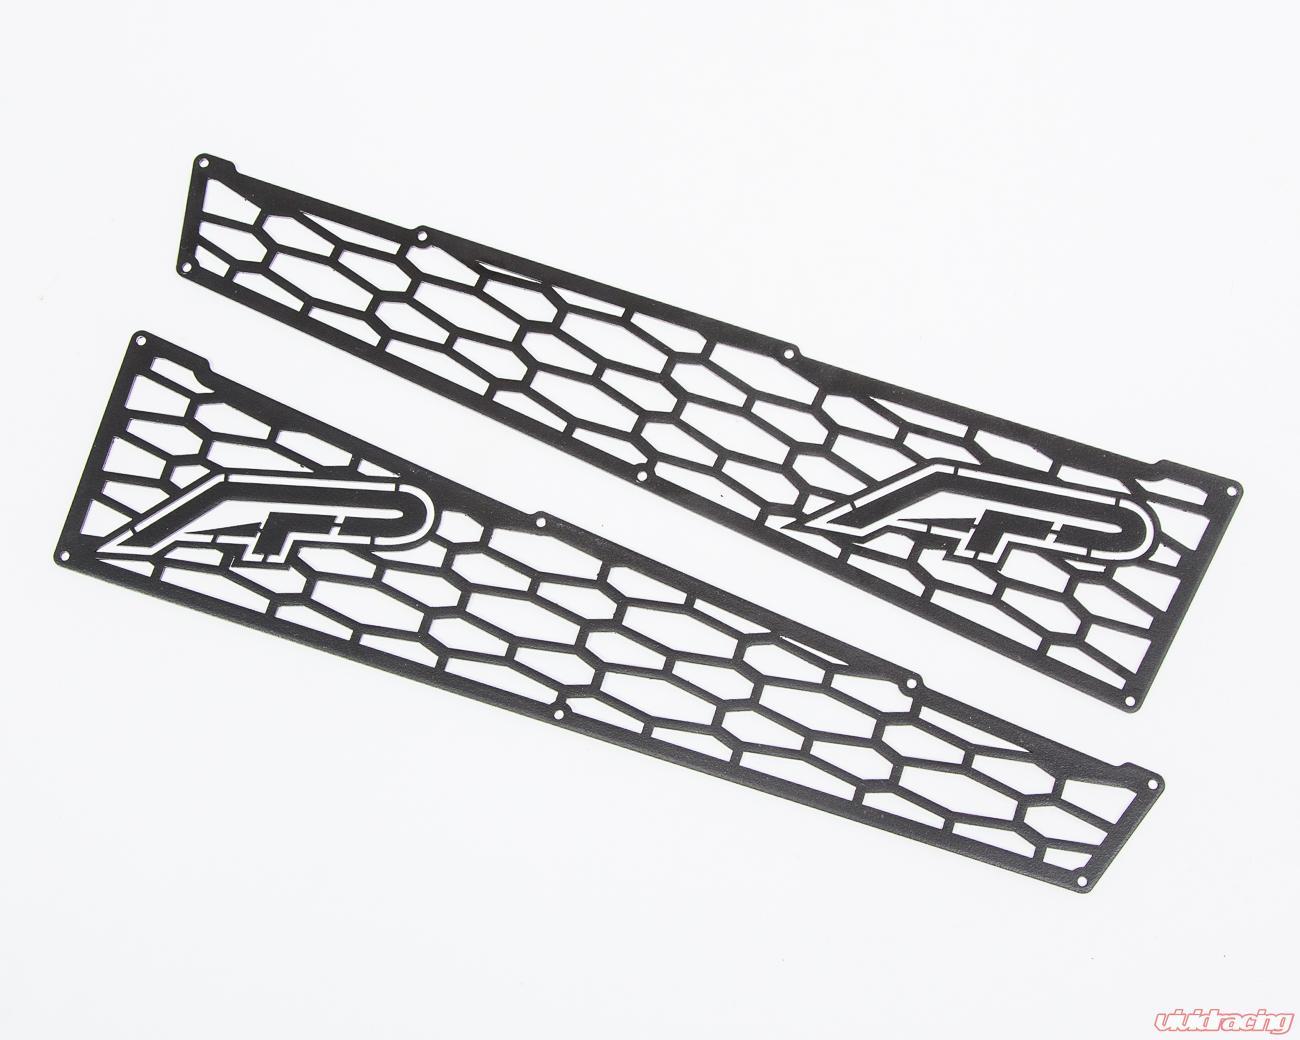 Agency Power Aluminum Side Vent Covers Polaris RZR 1000